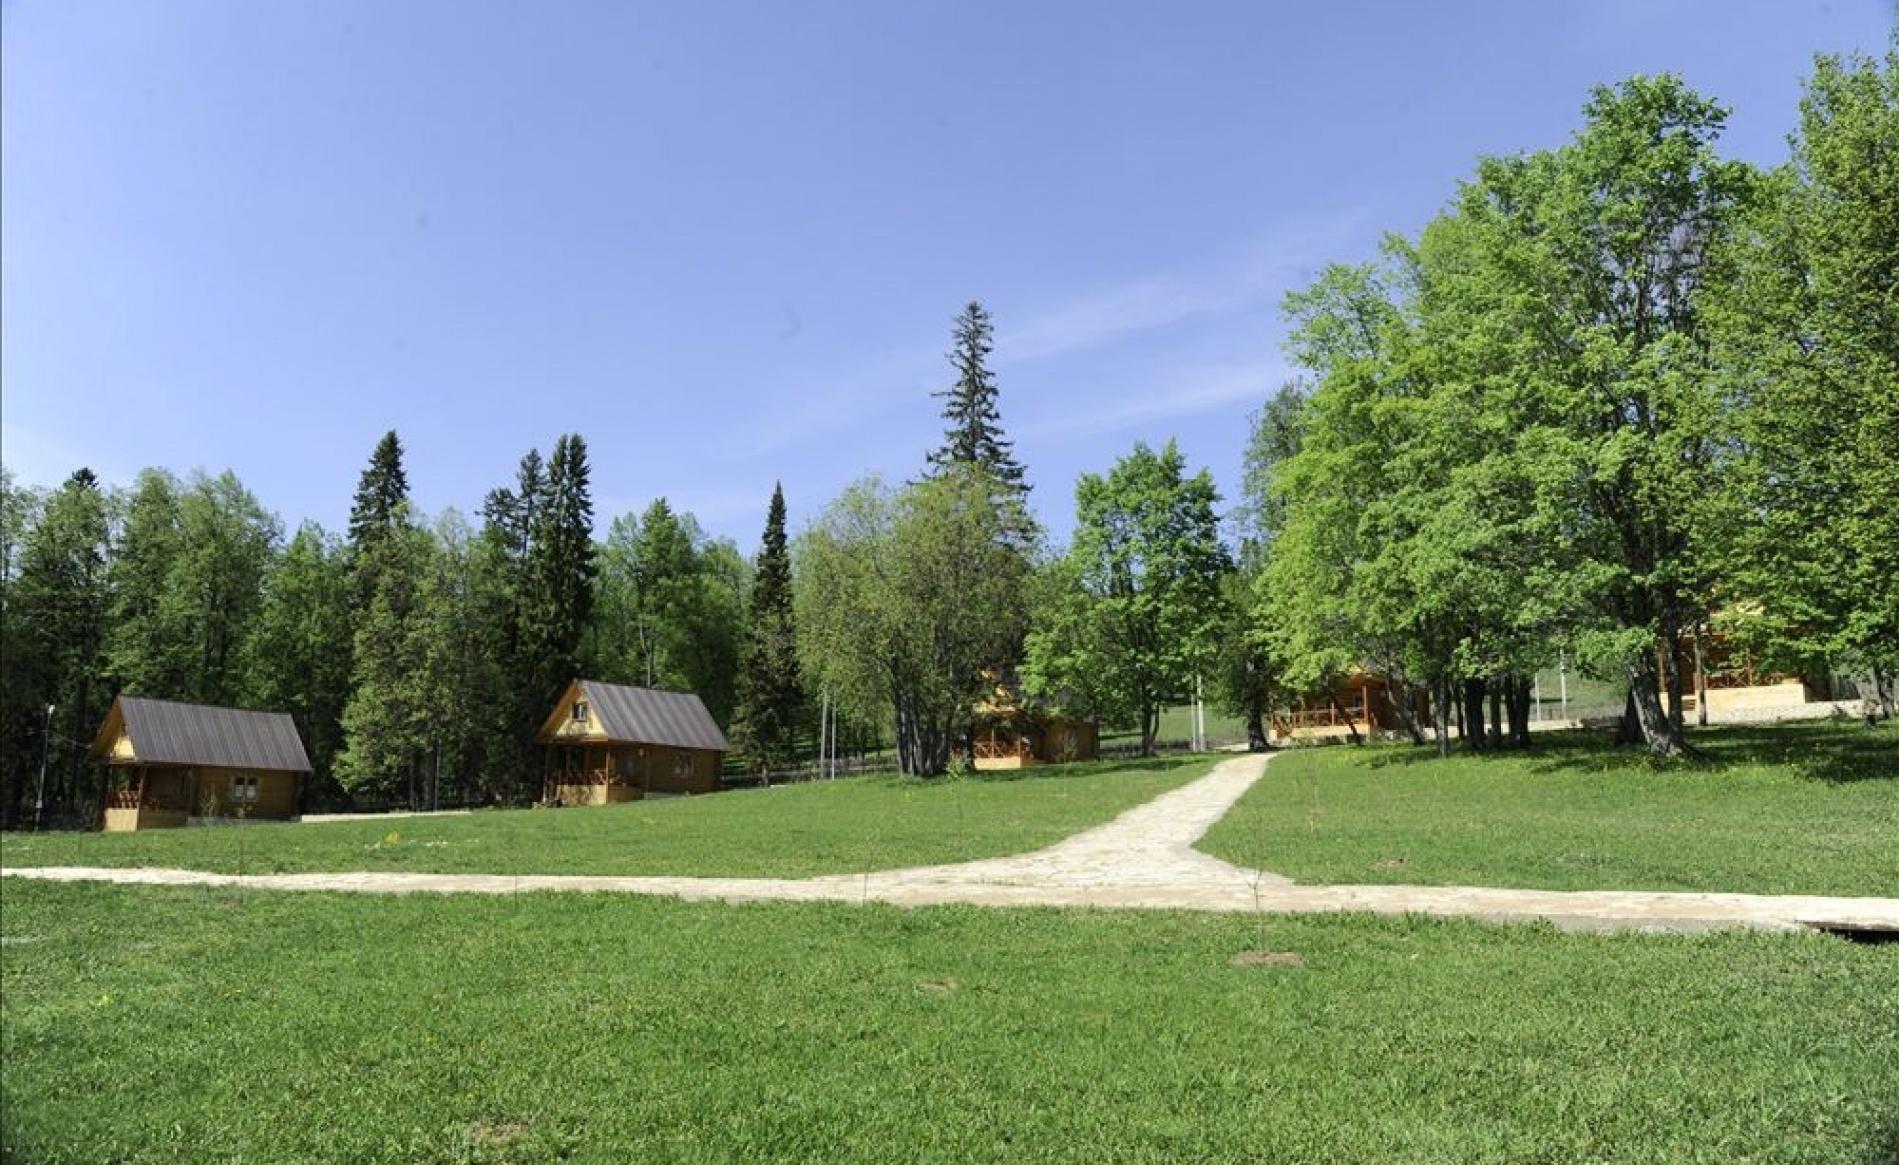 База отдыха «Сказка» Республика Башкортостан, фото 6